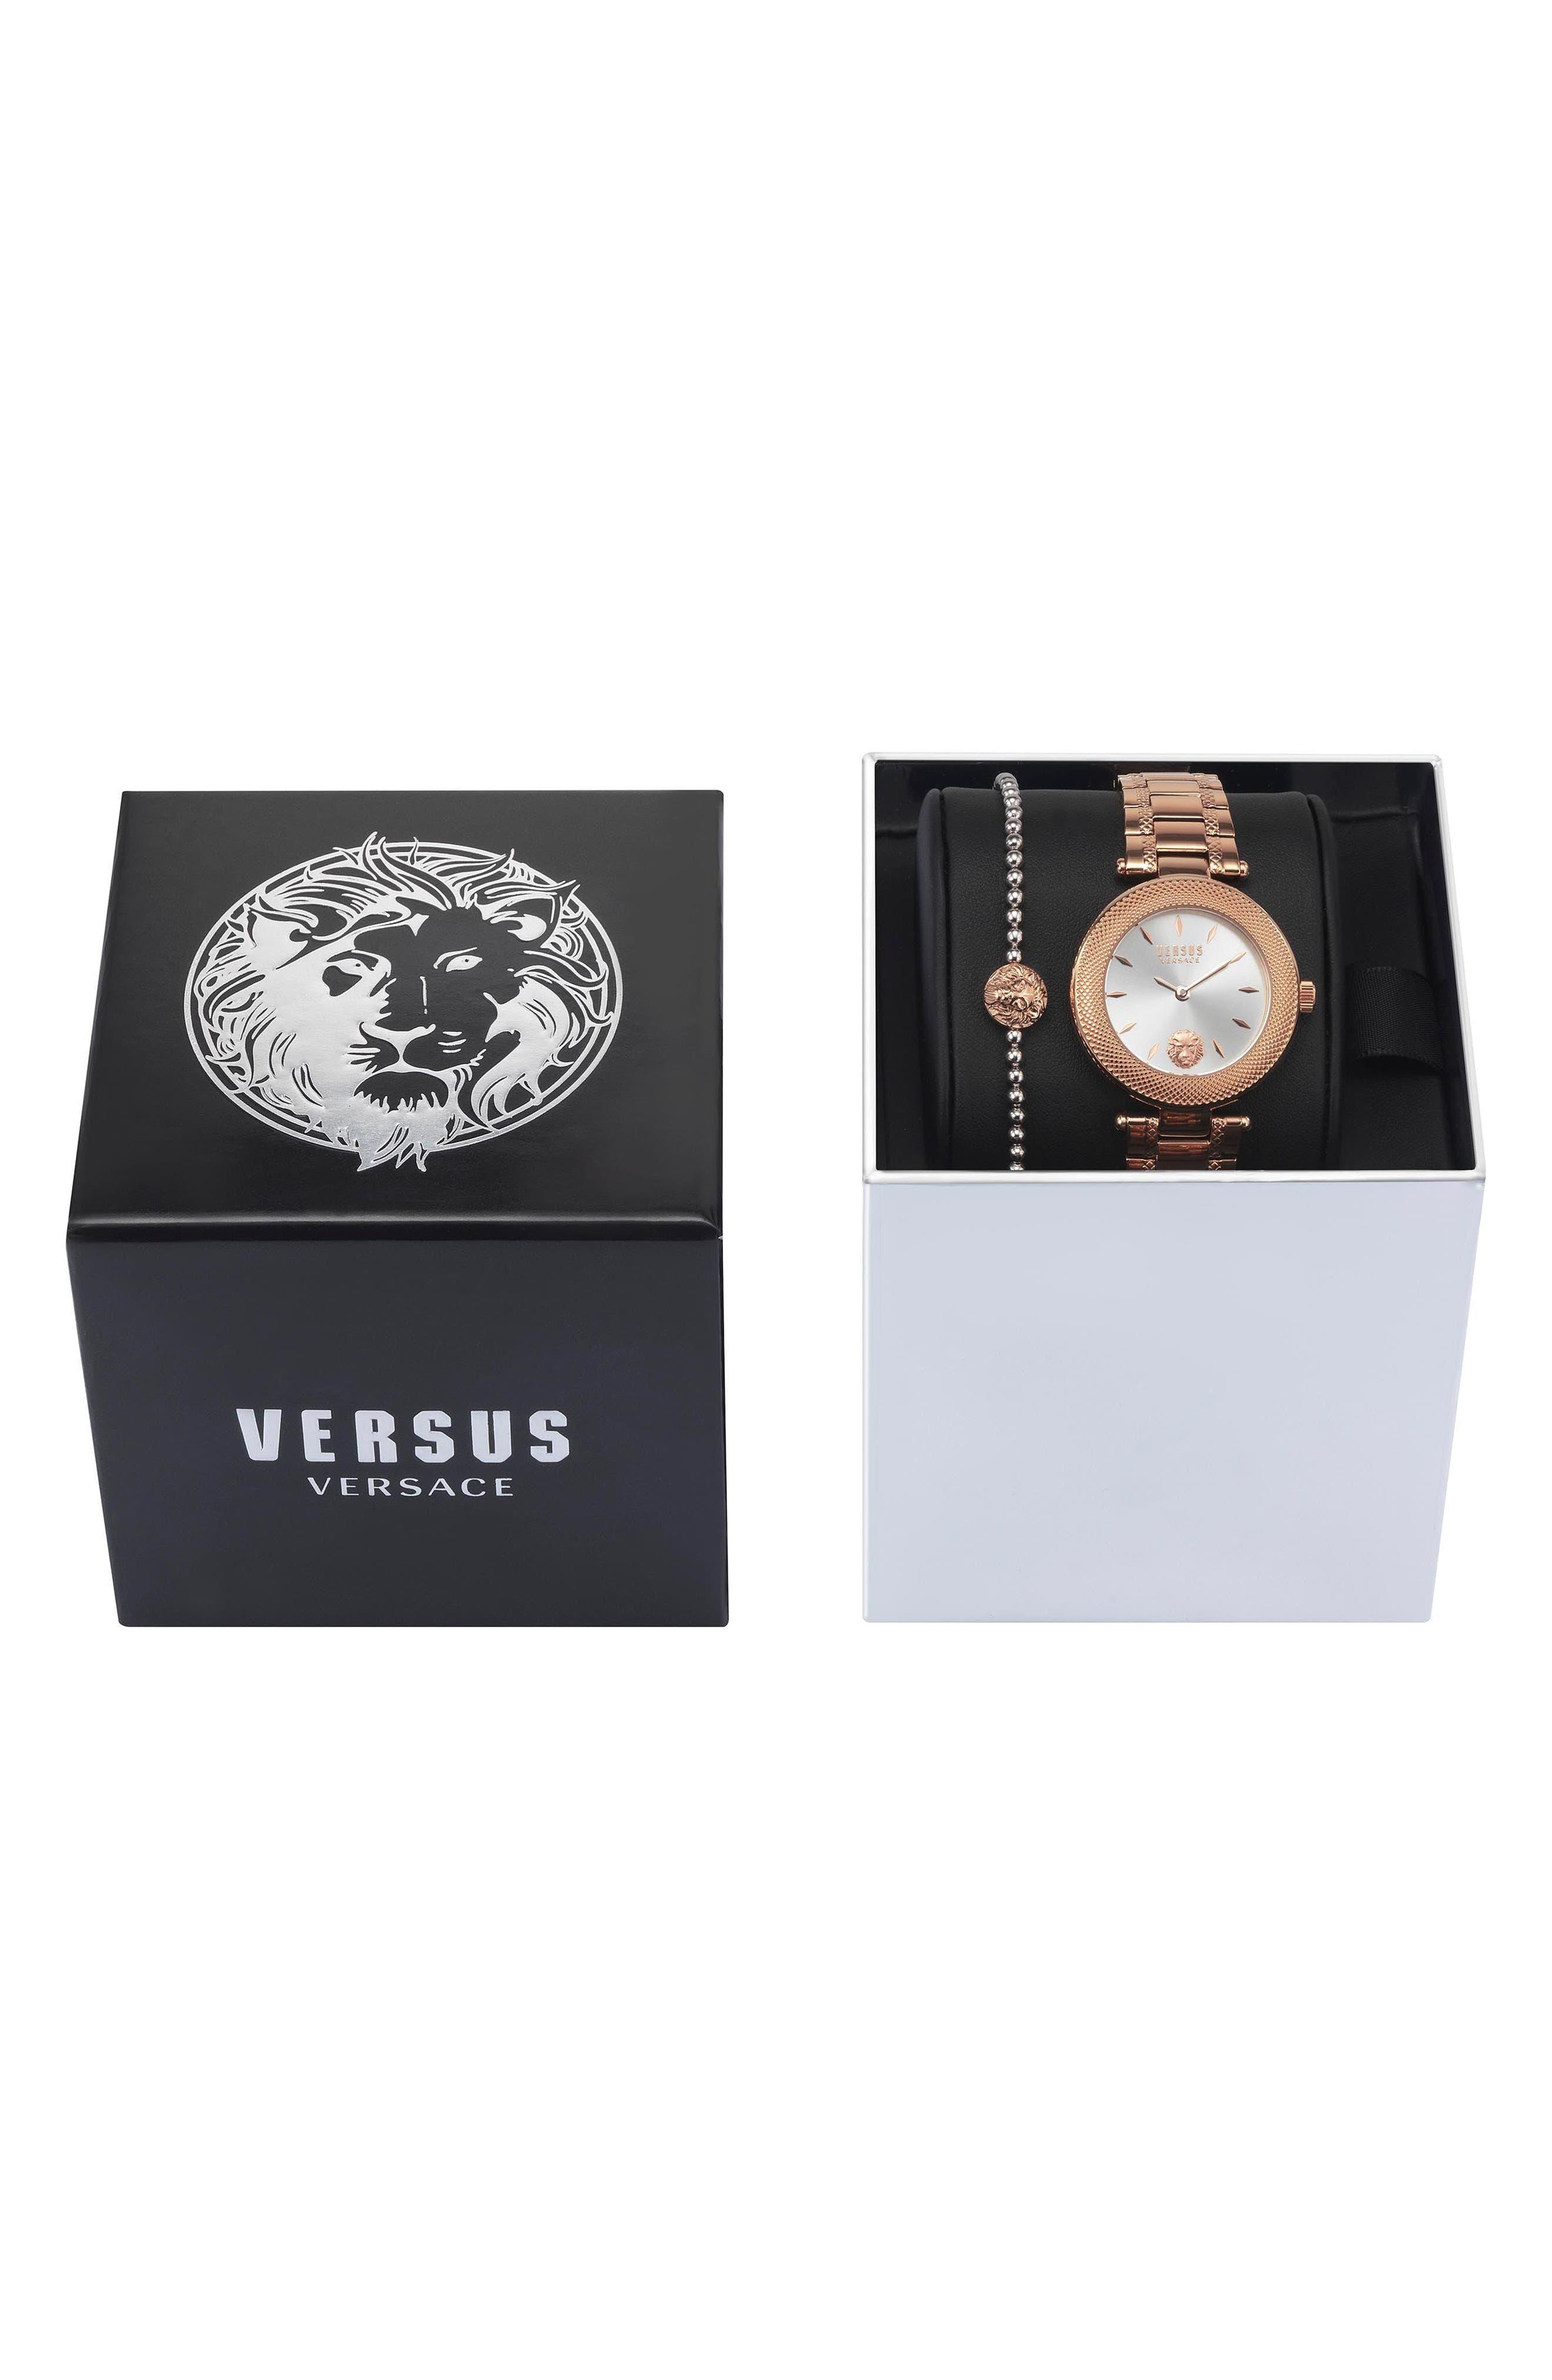 VERSUS VERSACE, Bricklane Watch Set, 36mm, Alternate thumbnail 3, color, ROSE GOLD/ SILVER